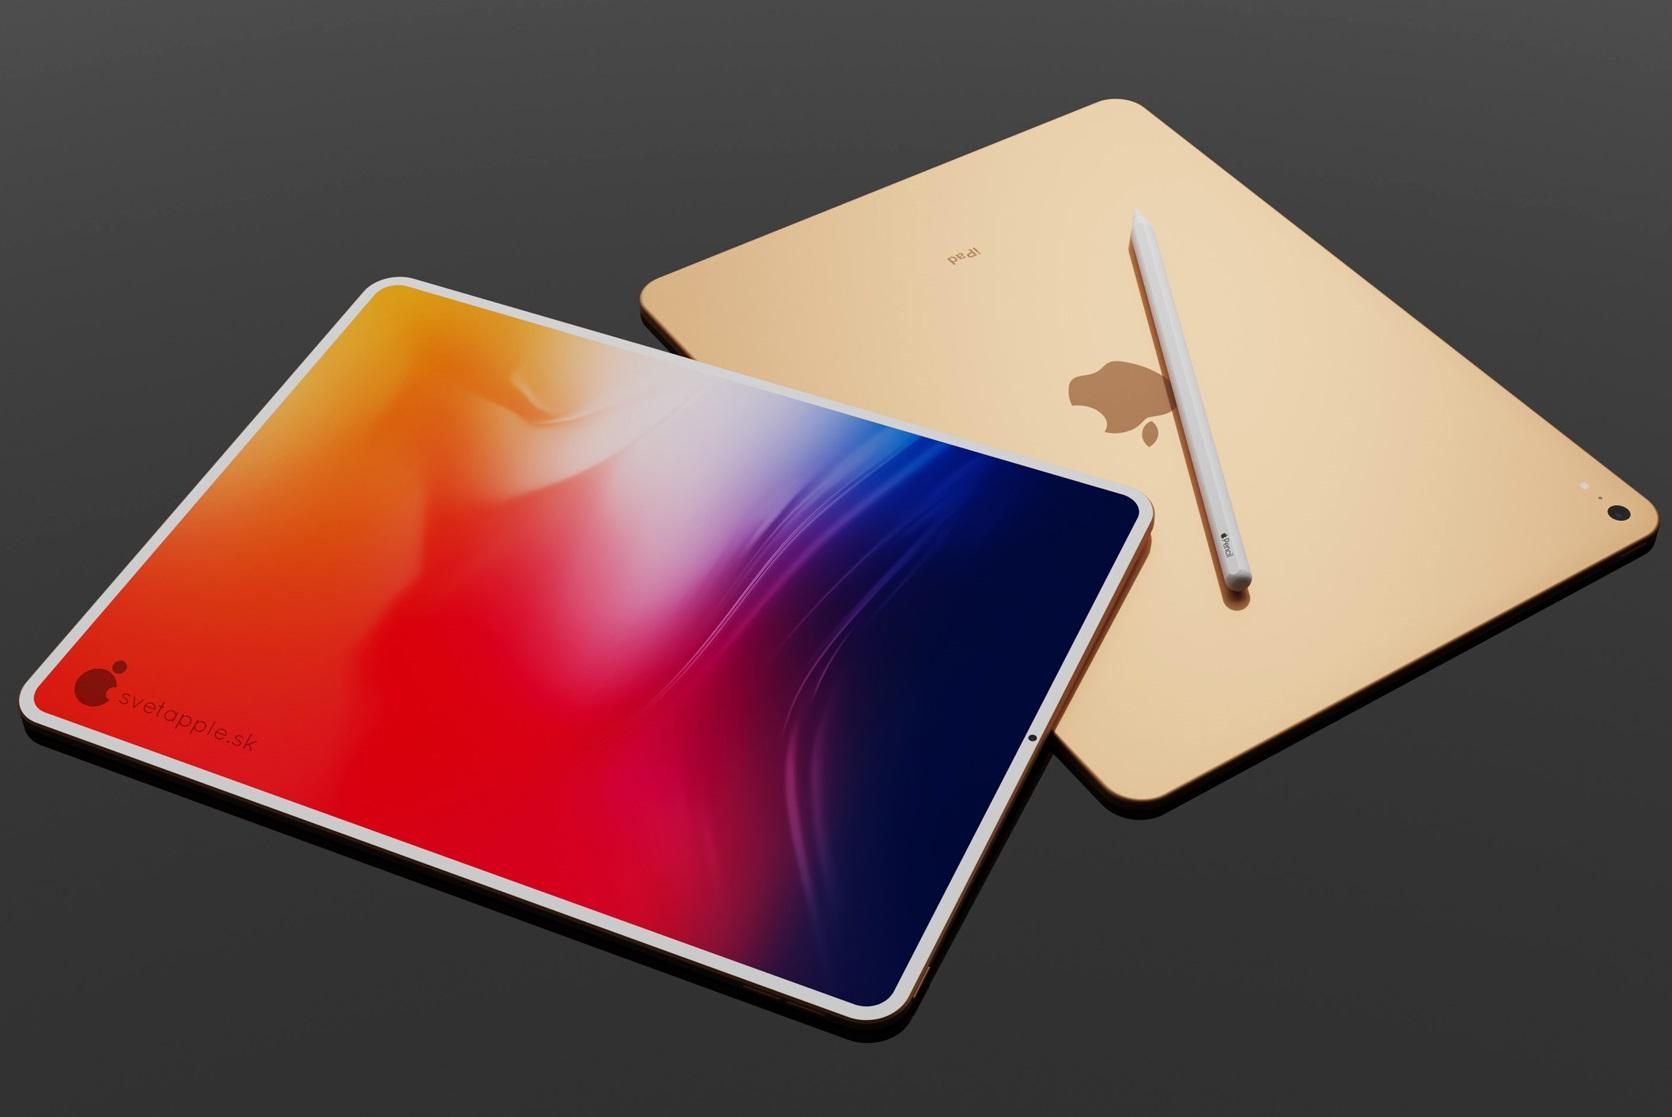 Apple iPad Air 4 soll im März 2021 im iPad Pro-Design ...